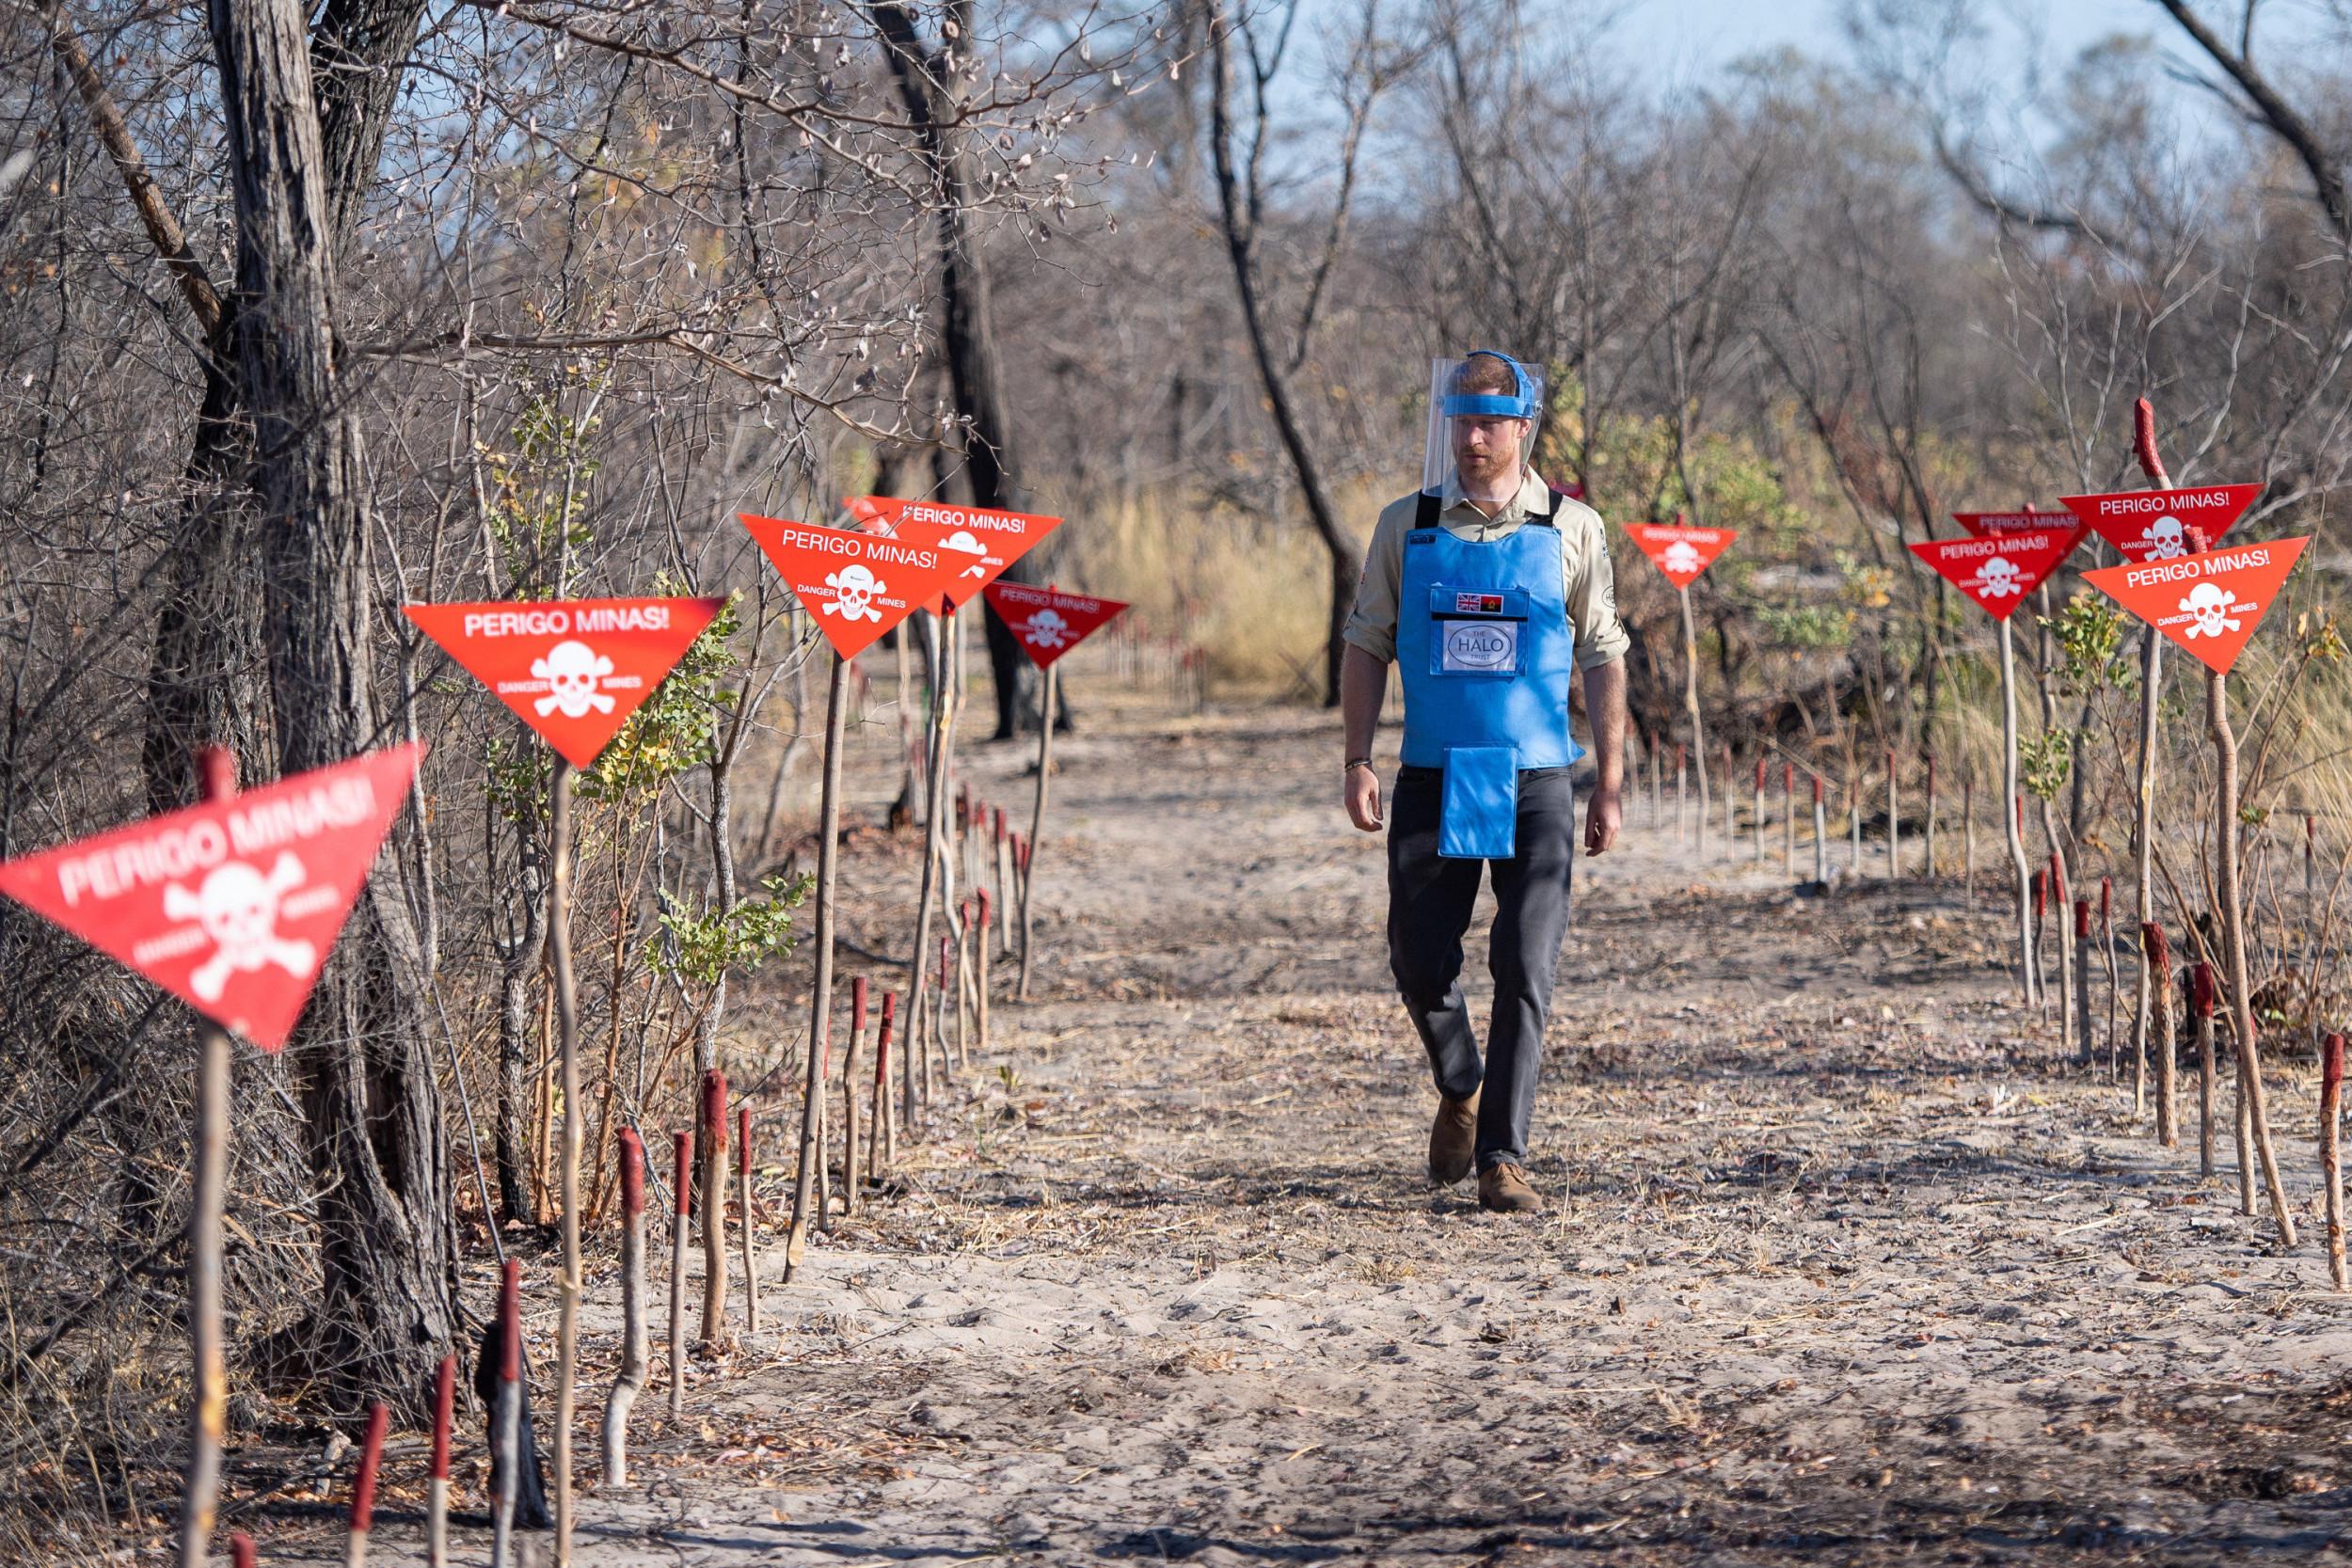 Harry walks through Angola minefield 22 years after Diana